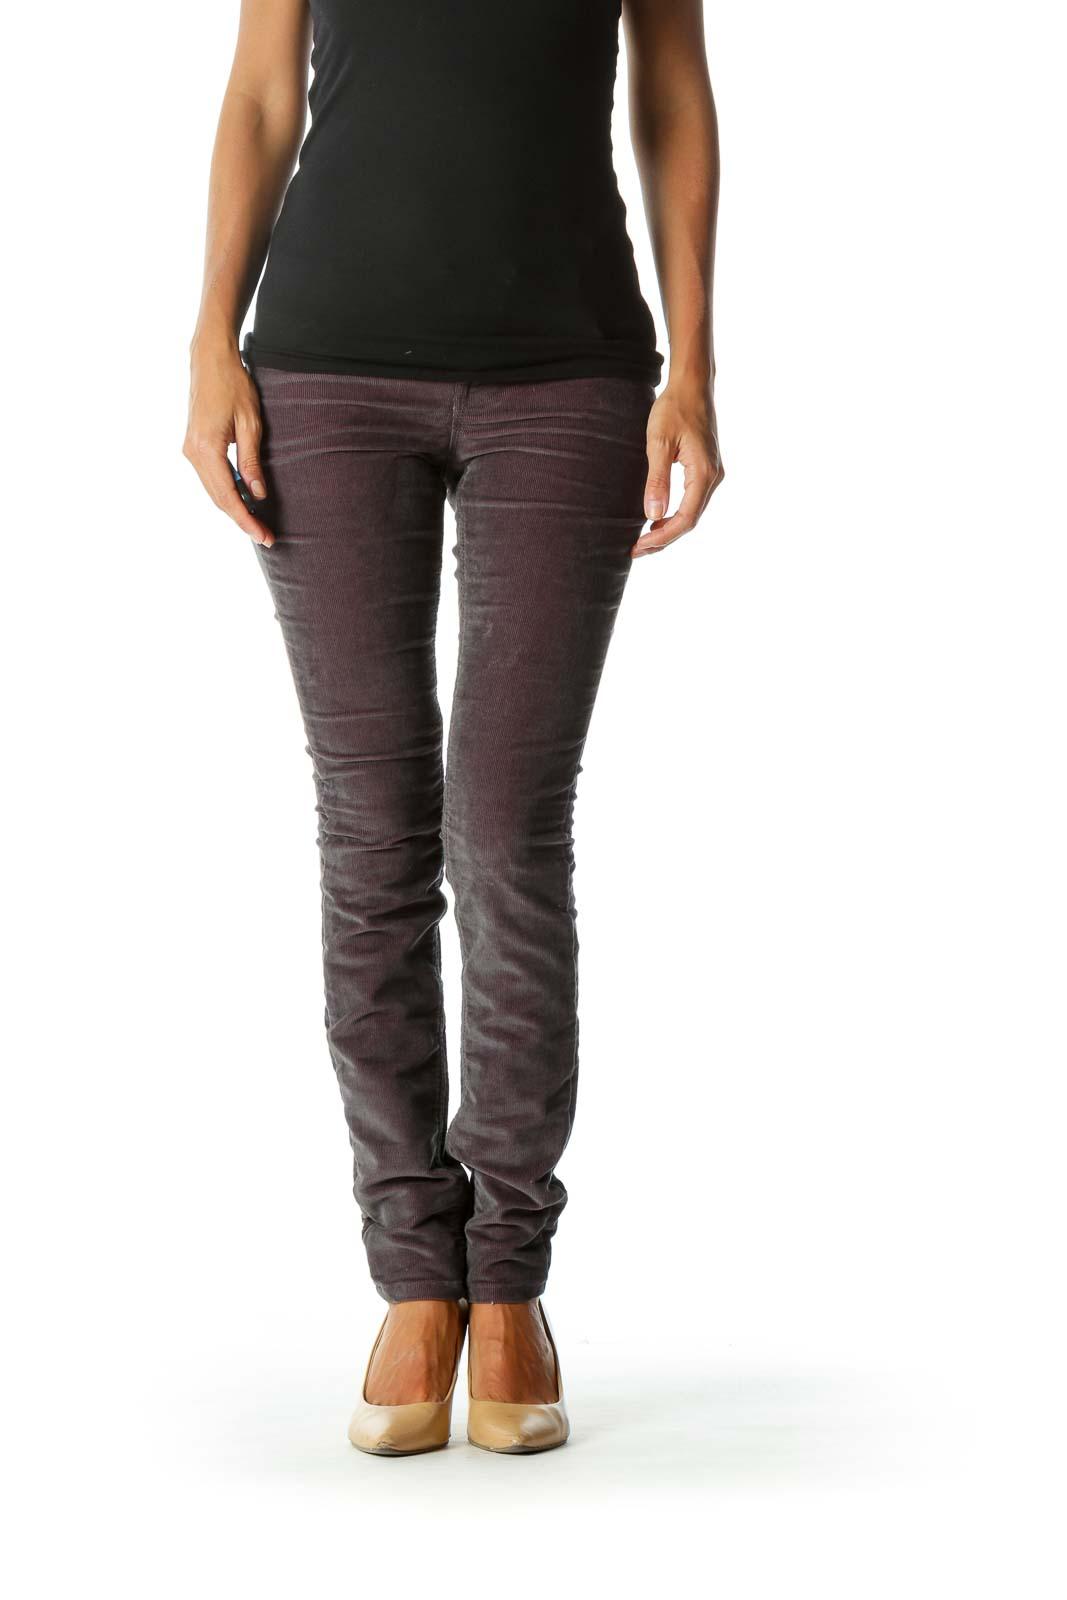 Purple & Gray Corduroy Skinny Jeans Front